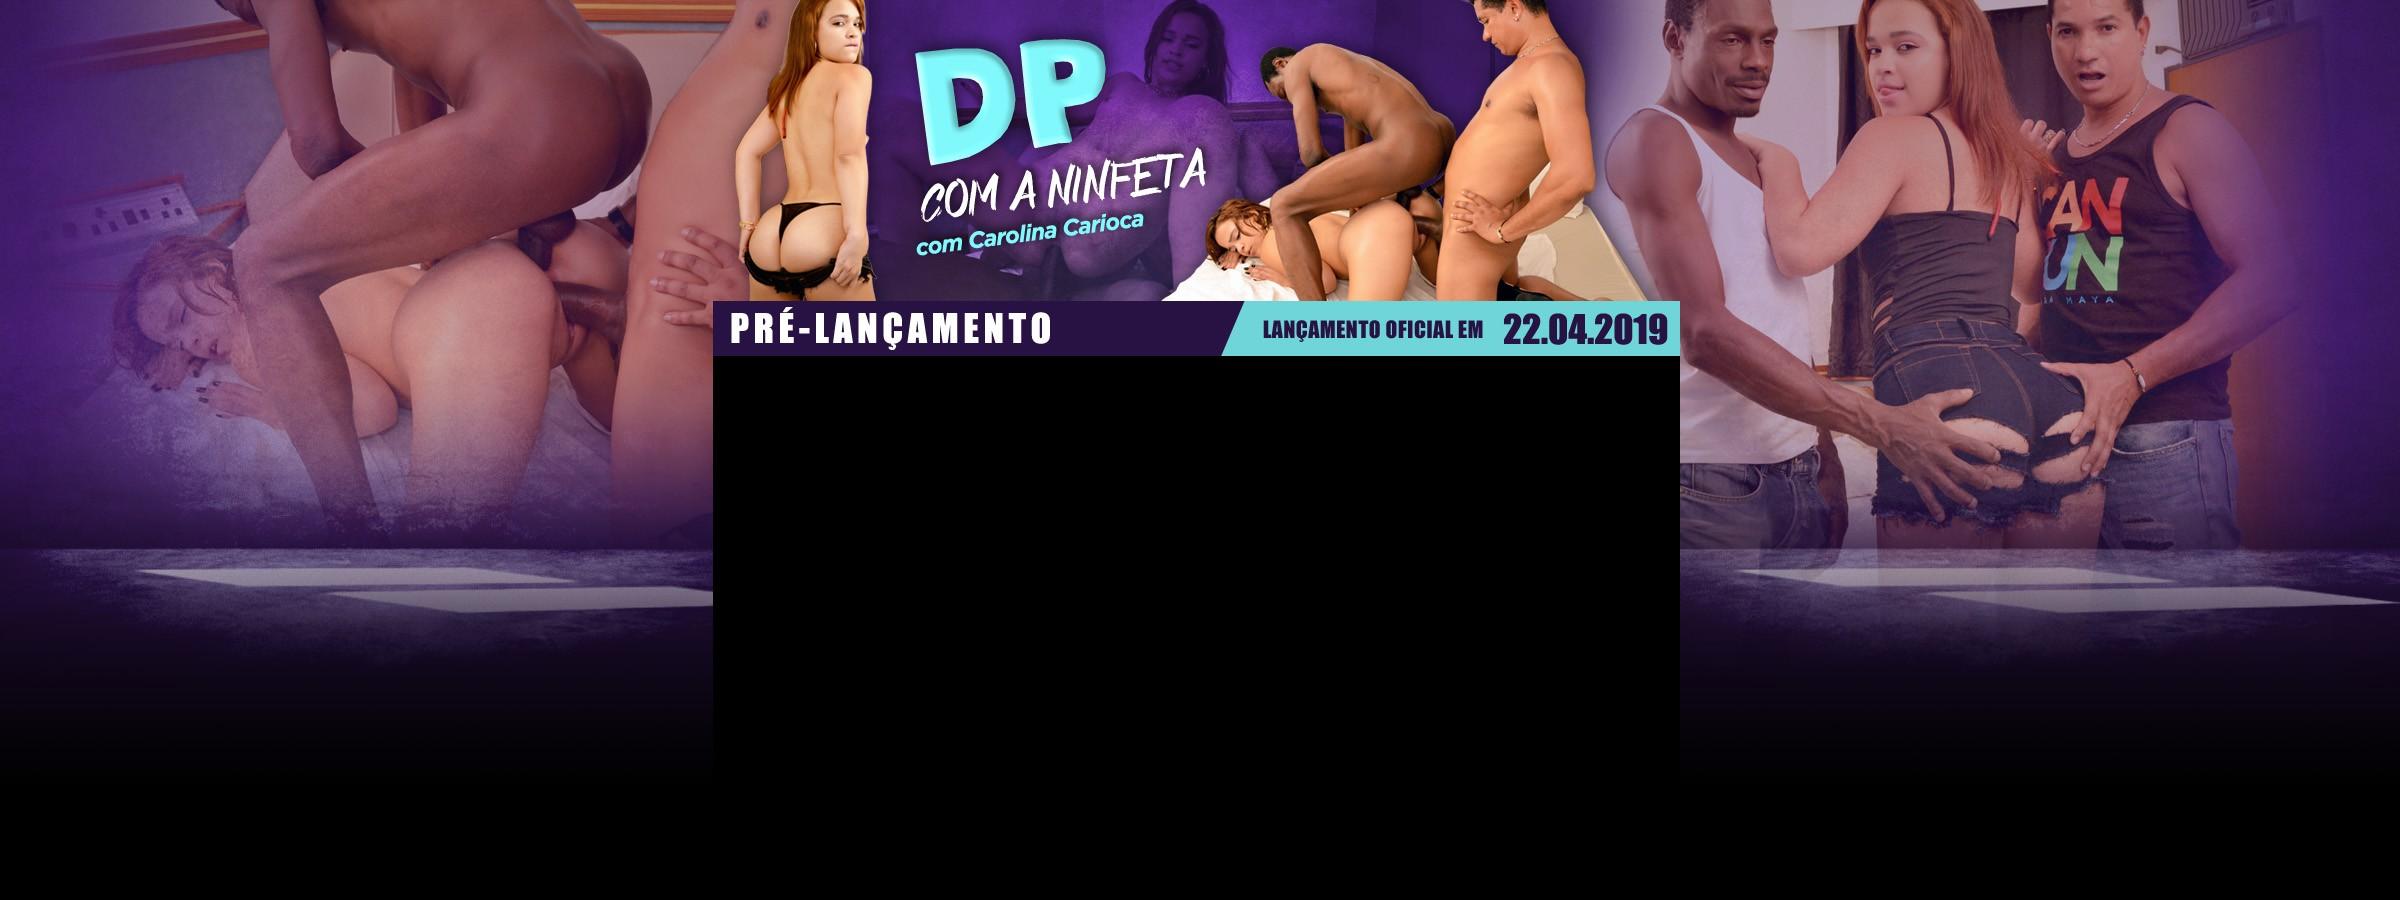 Dp com a ninfeta Carolina Carioca